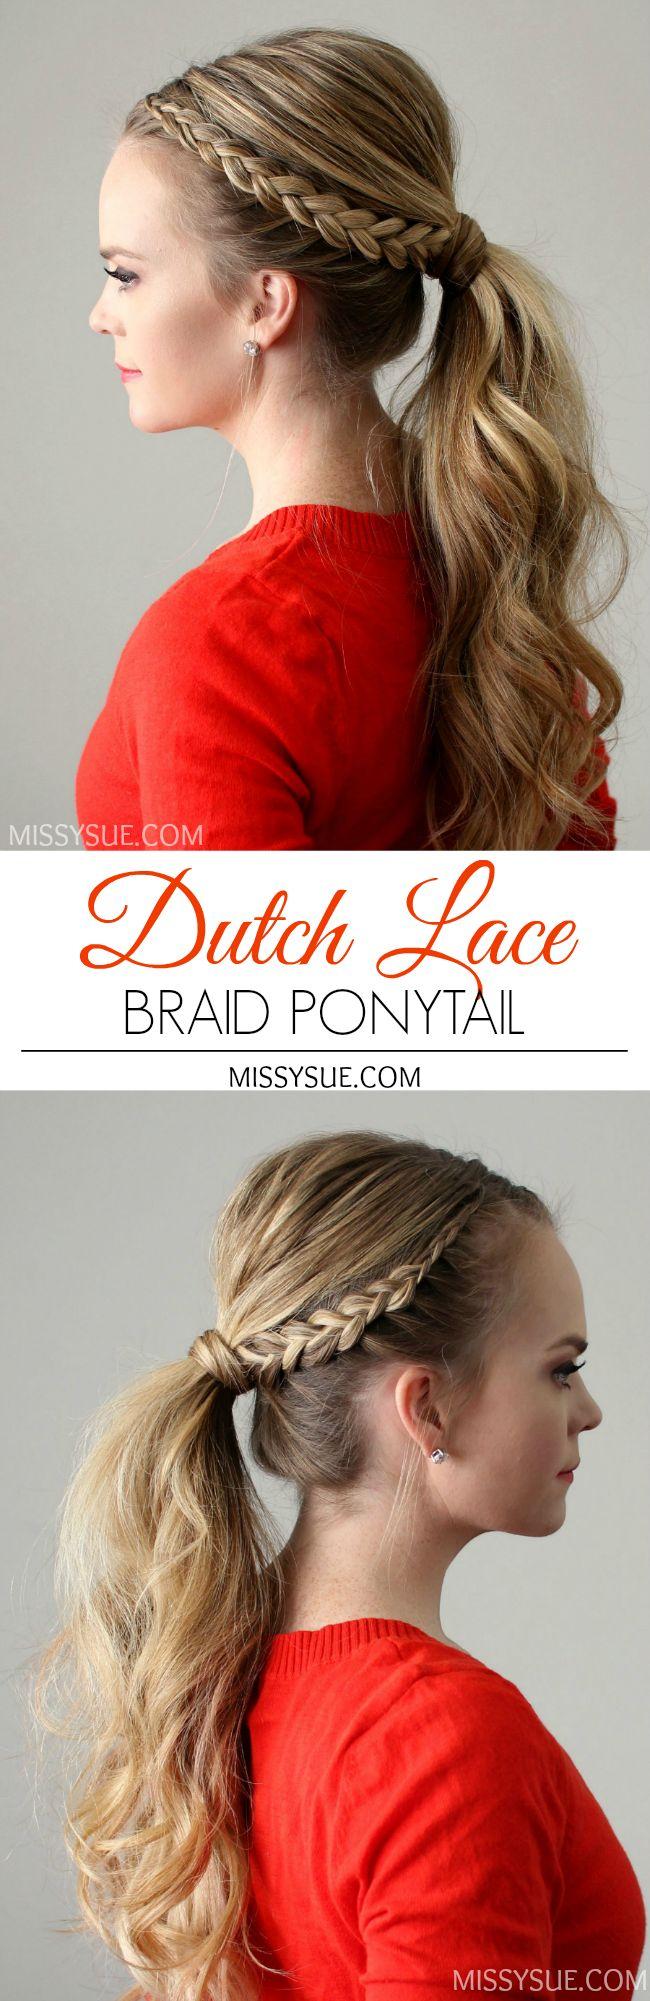 dutch-lace-braid-ponytail-tutorial